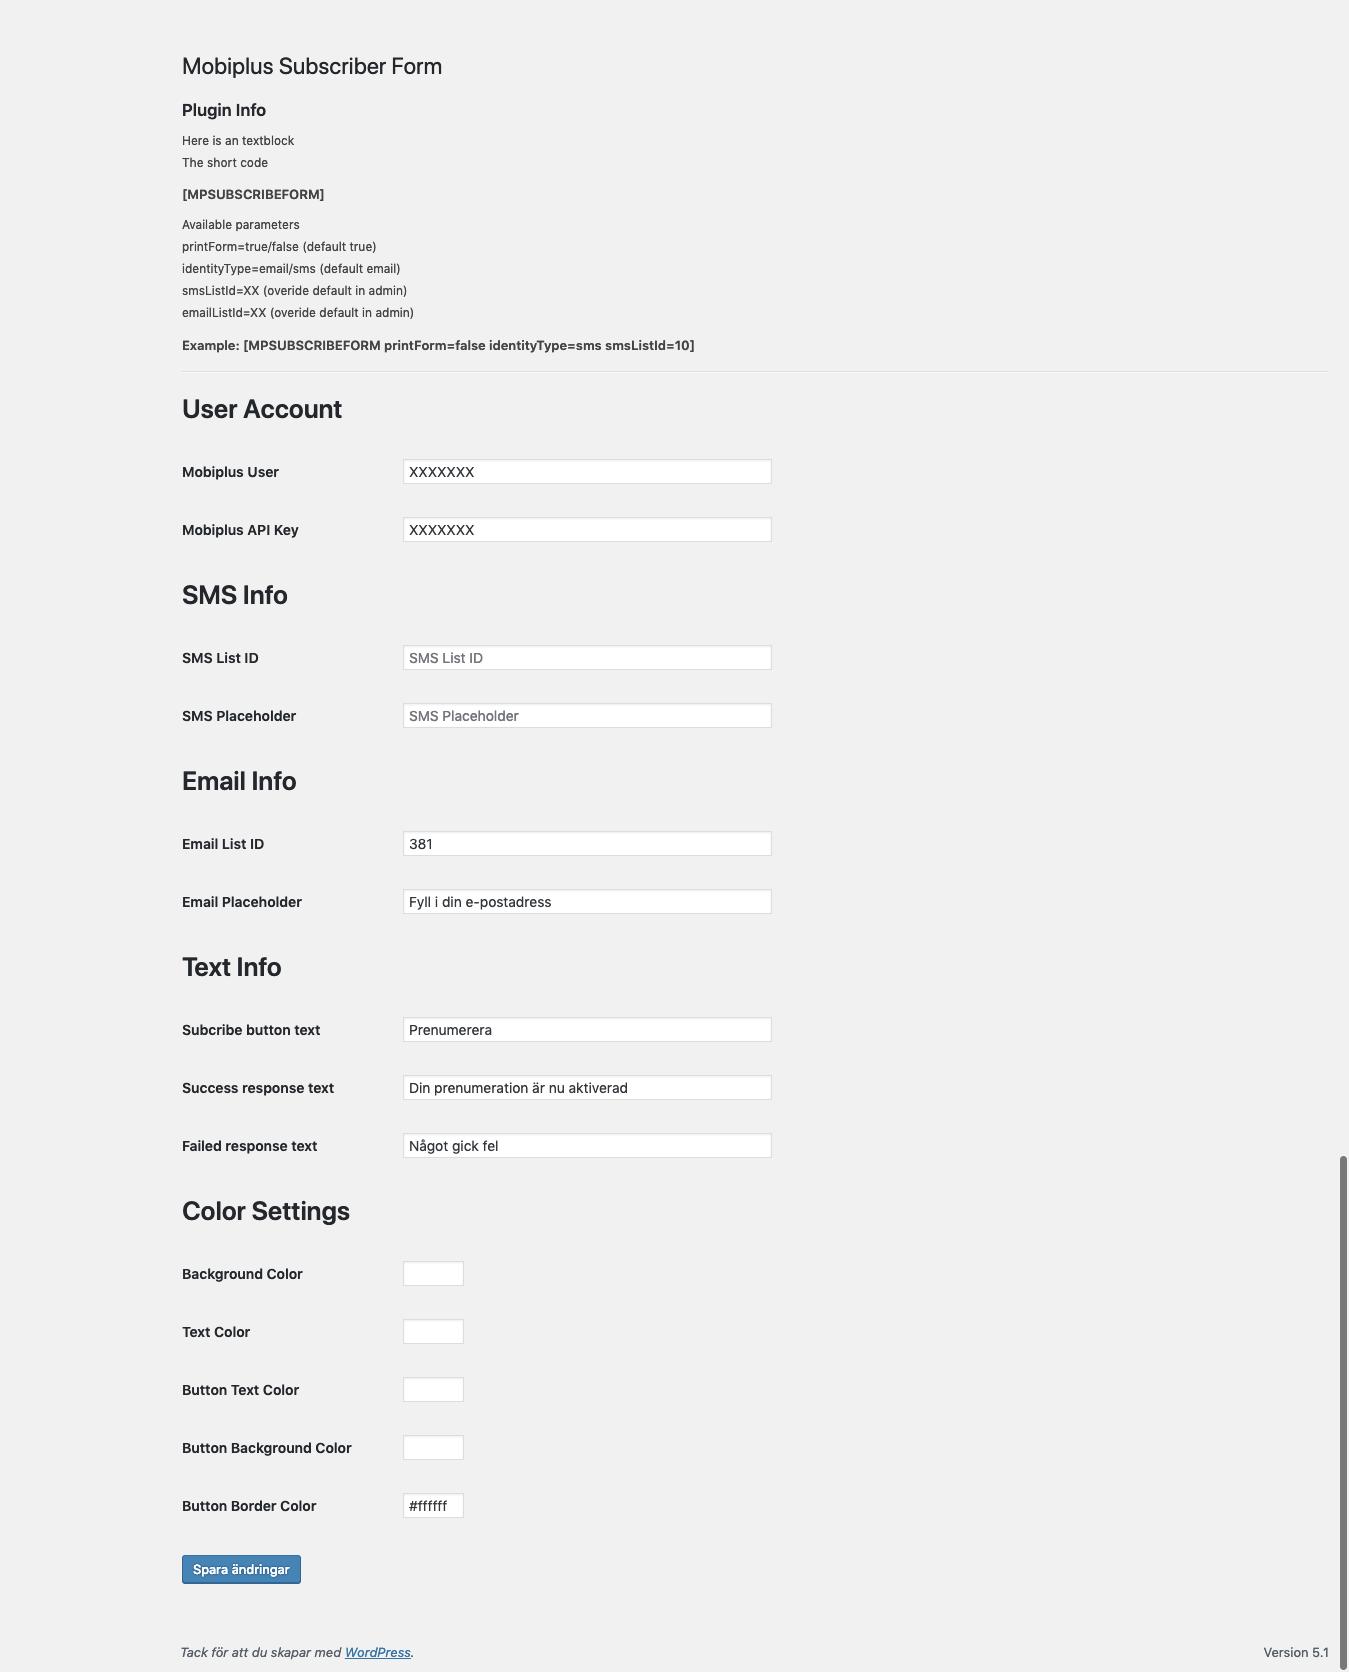 Admin page - Settings